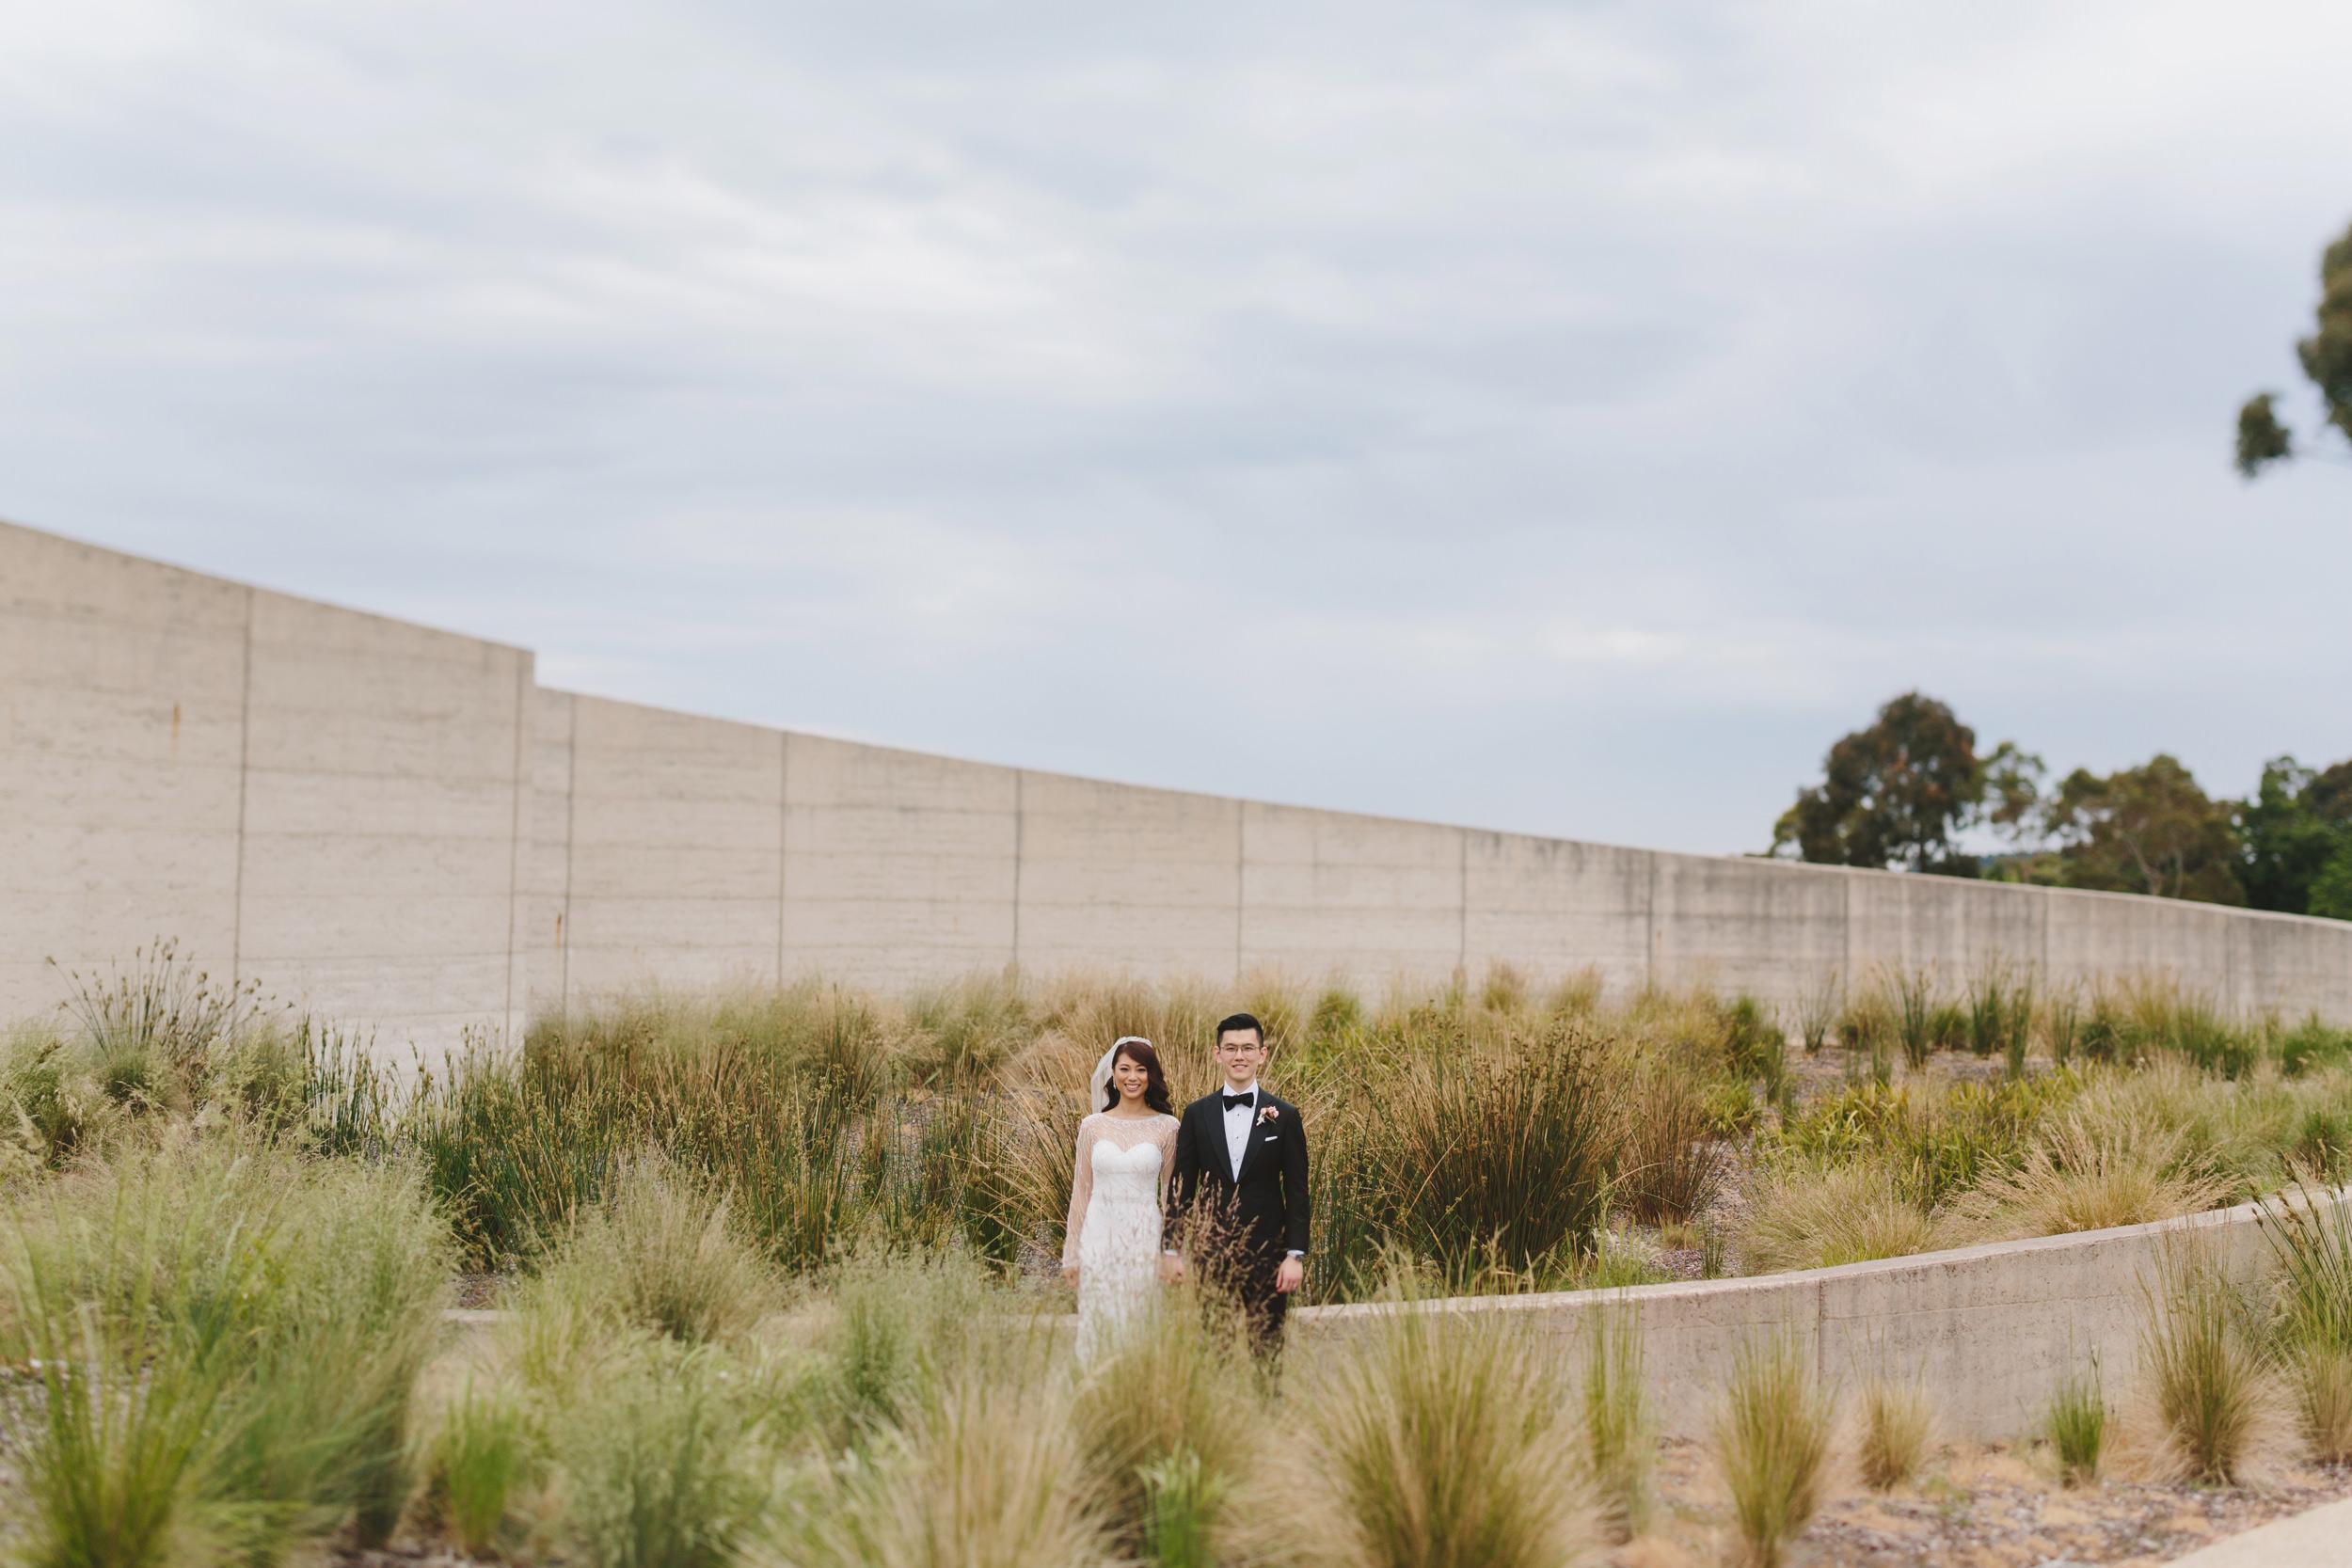 Melbourne Winery Wedding Daryl & Adeline 56.JPG